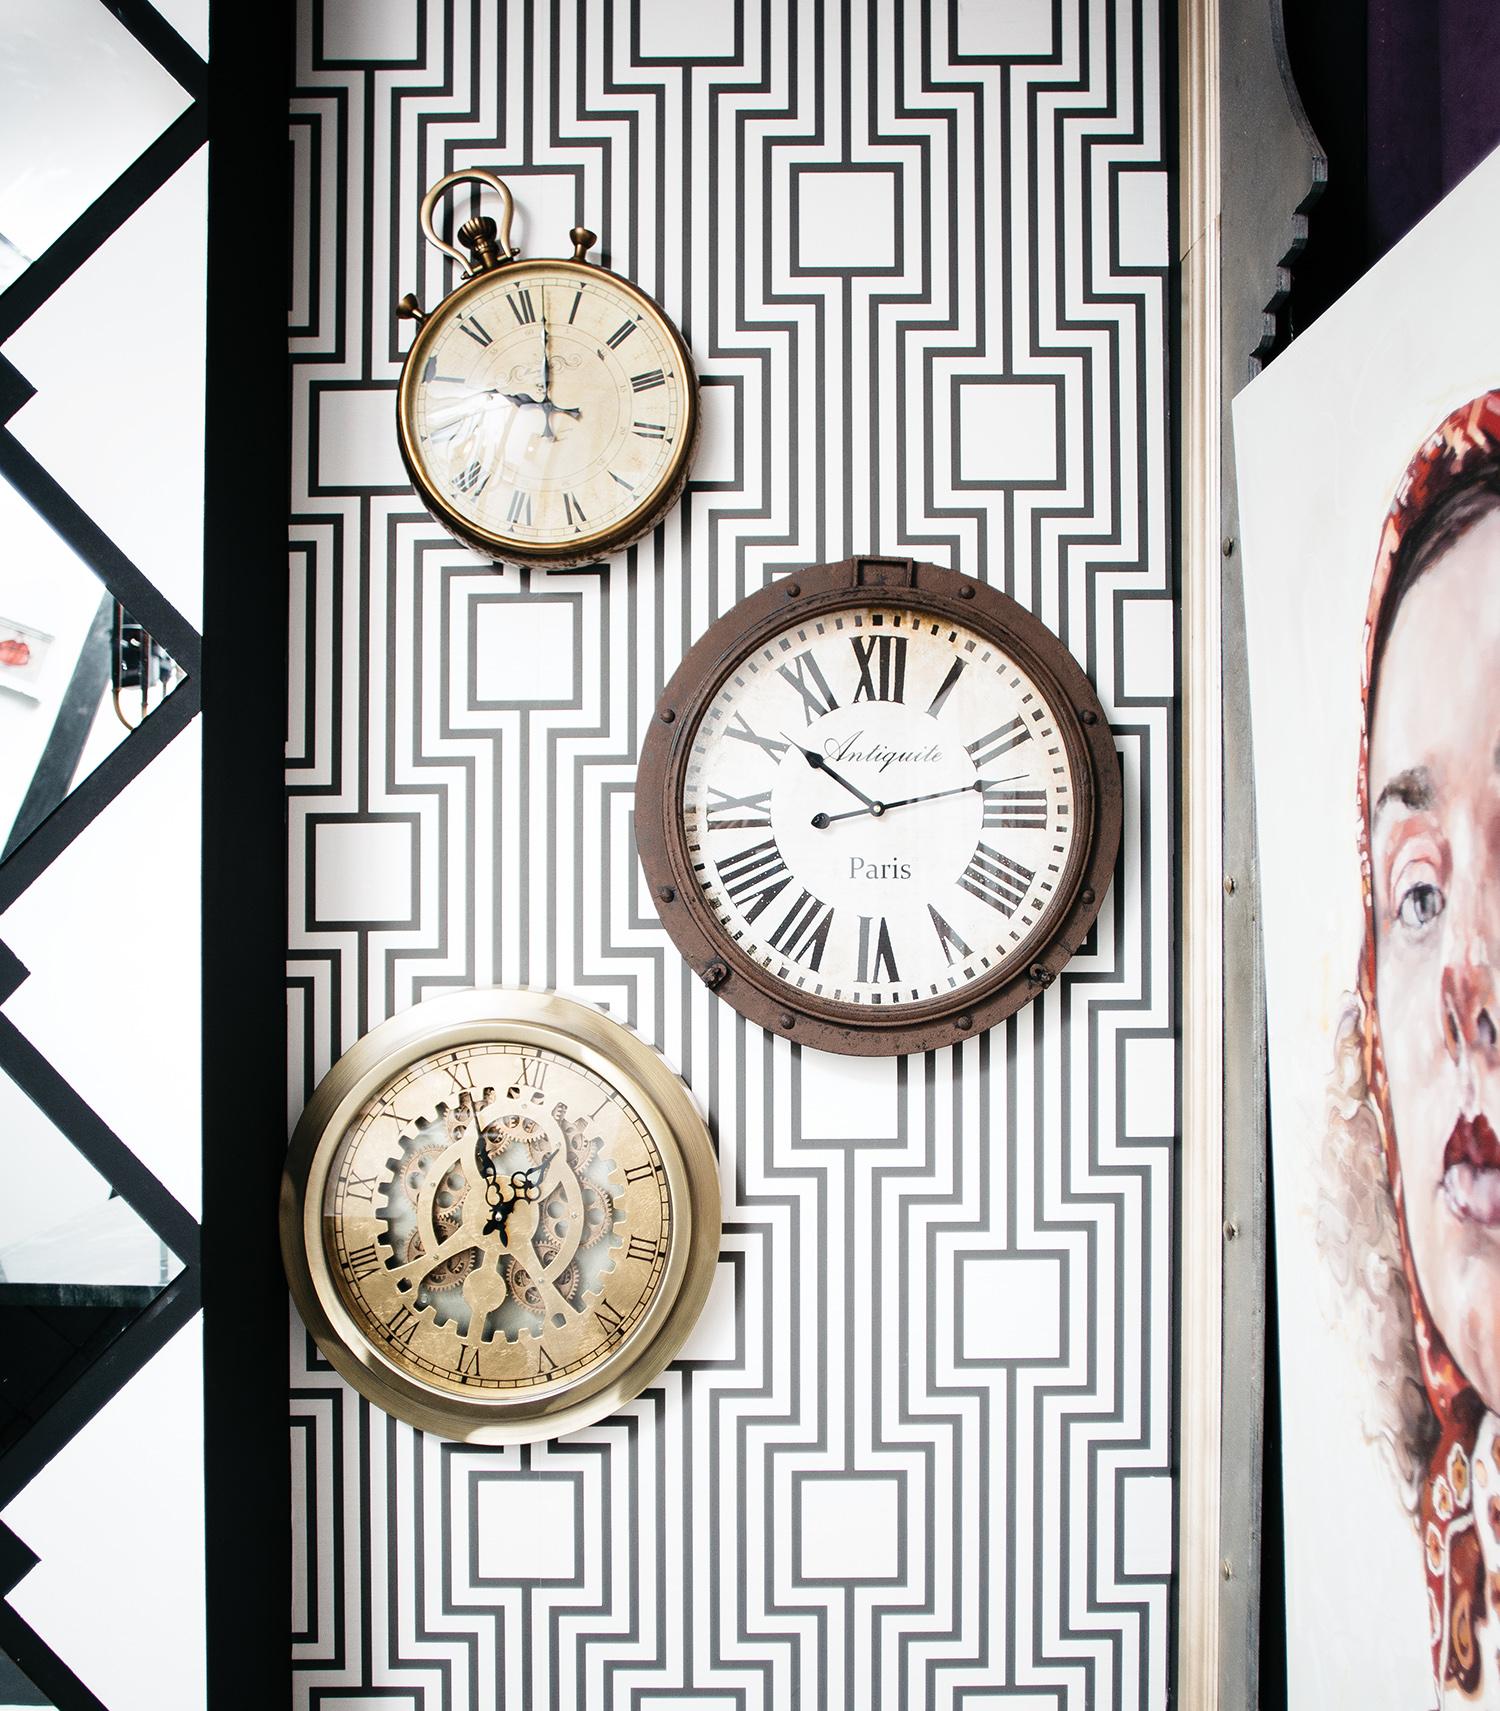 Vignettes_clocks.jpg